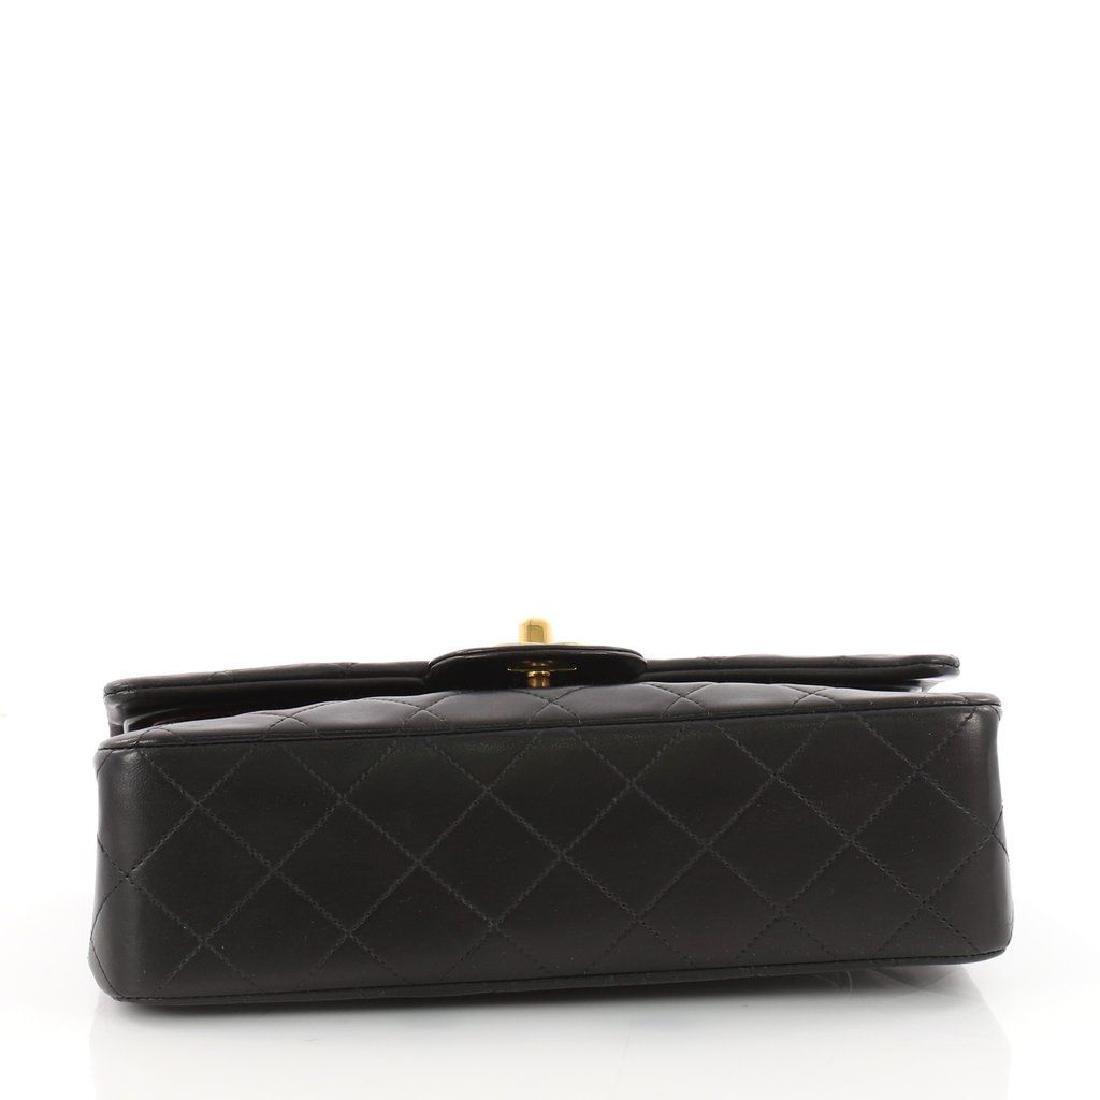 Chanel Double Flap Classic Shoulder Bag Black Lambskin - 4